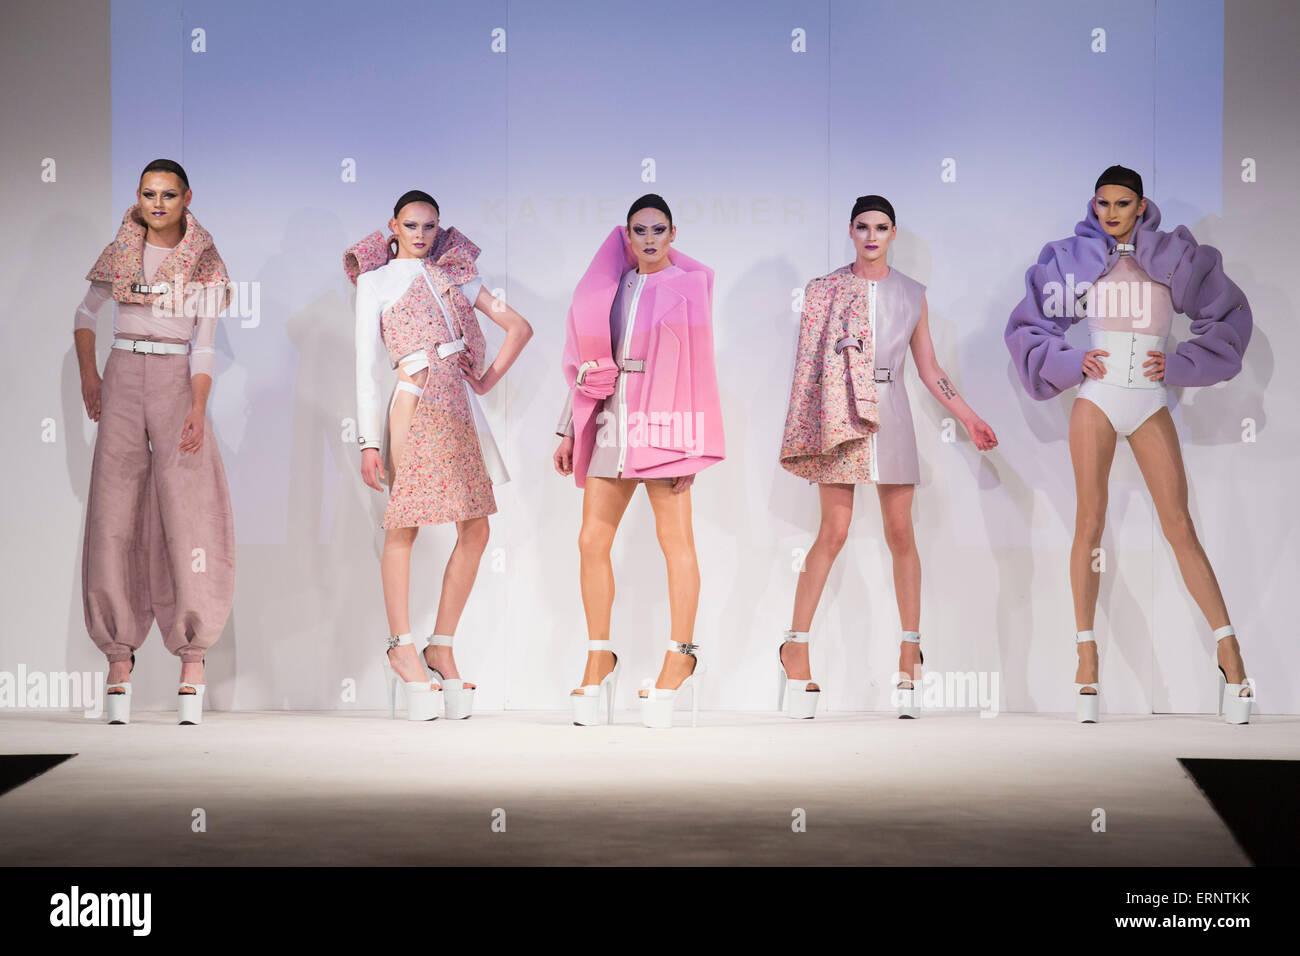 Graduate Fashion Week 2018 64